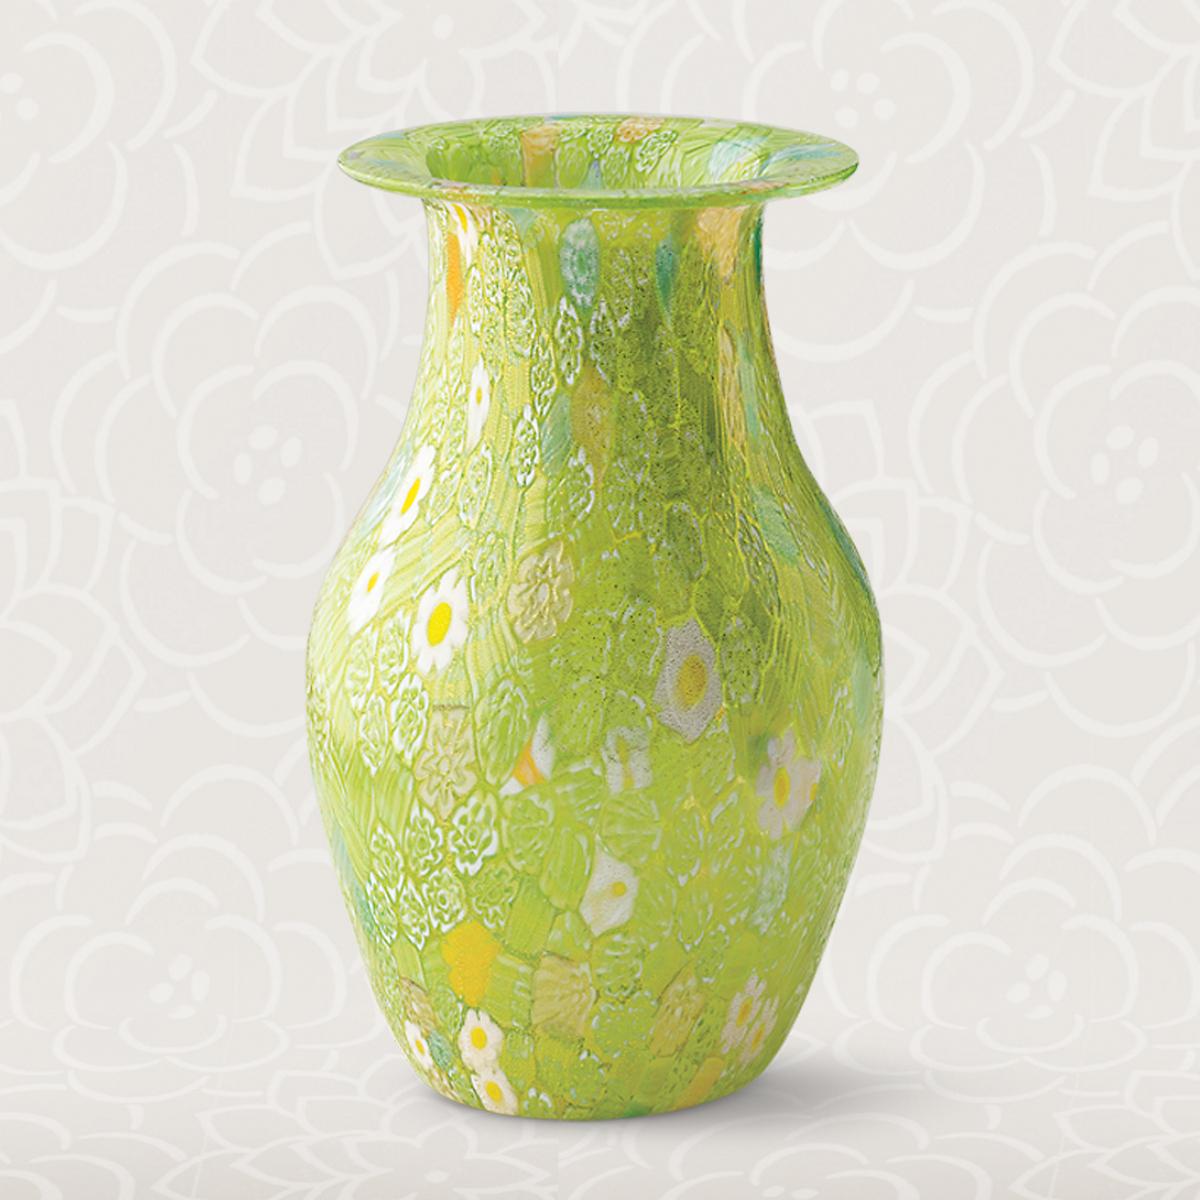 Murano Green Millefiori Vase Gumps